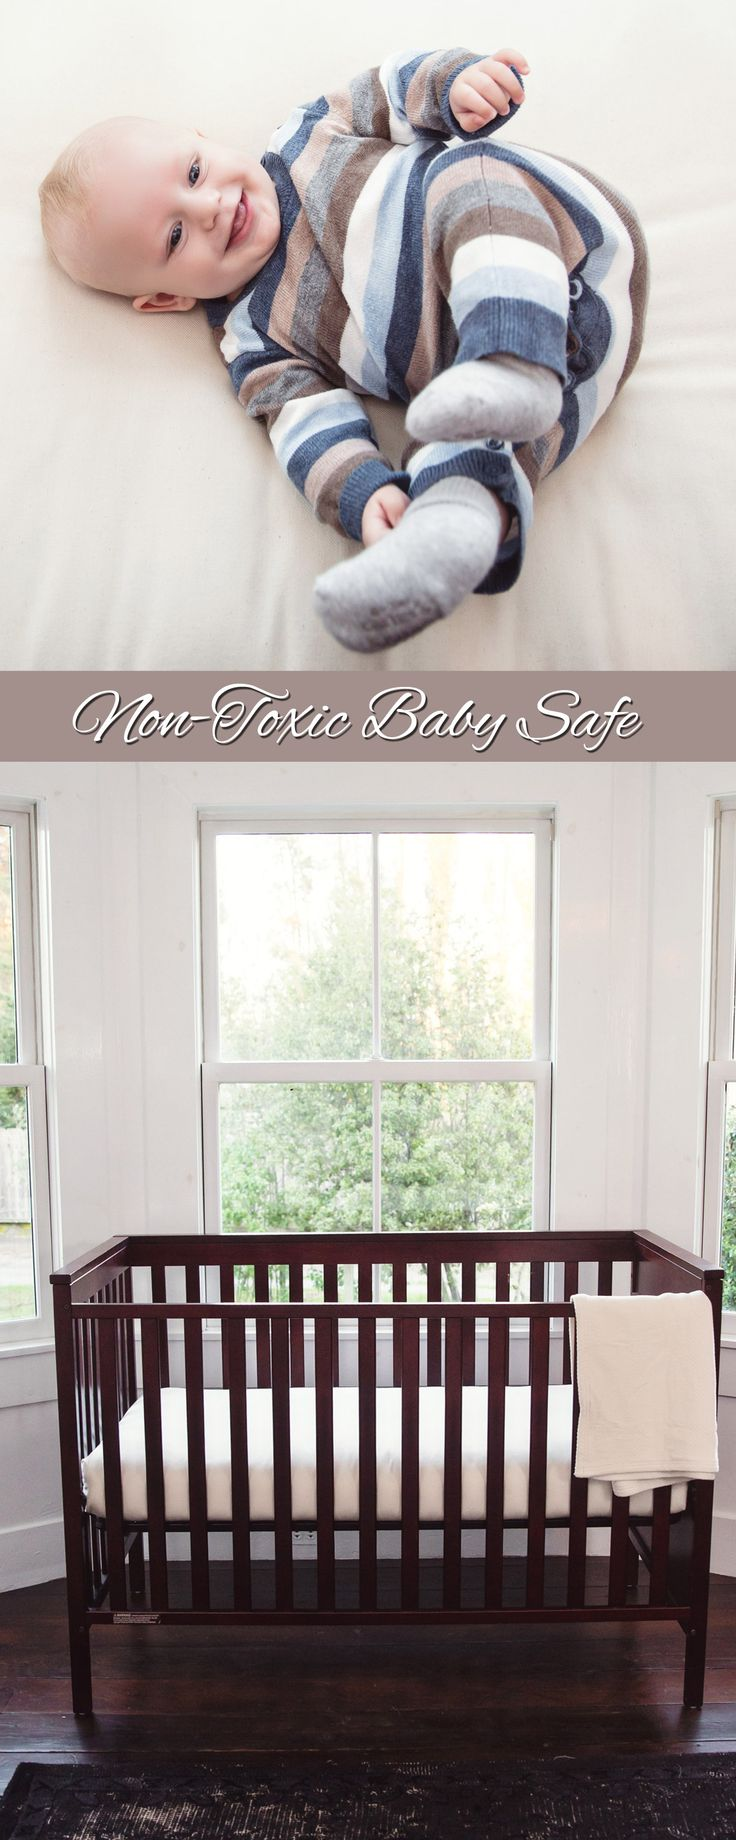 lullaby organic cotton baby crib mattress firm by the futon shop